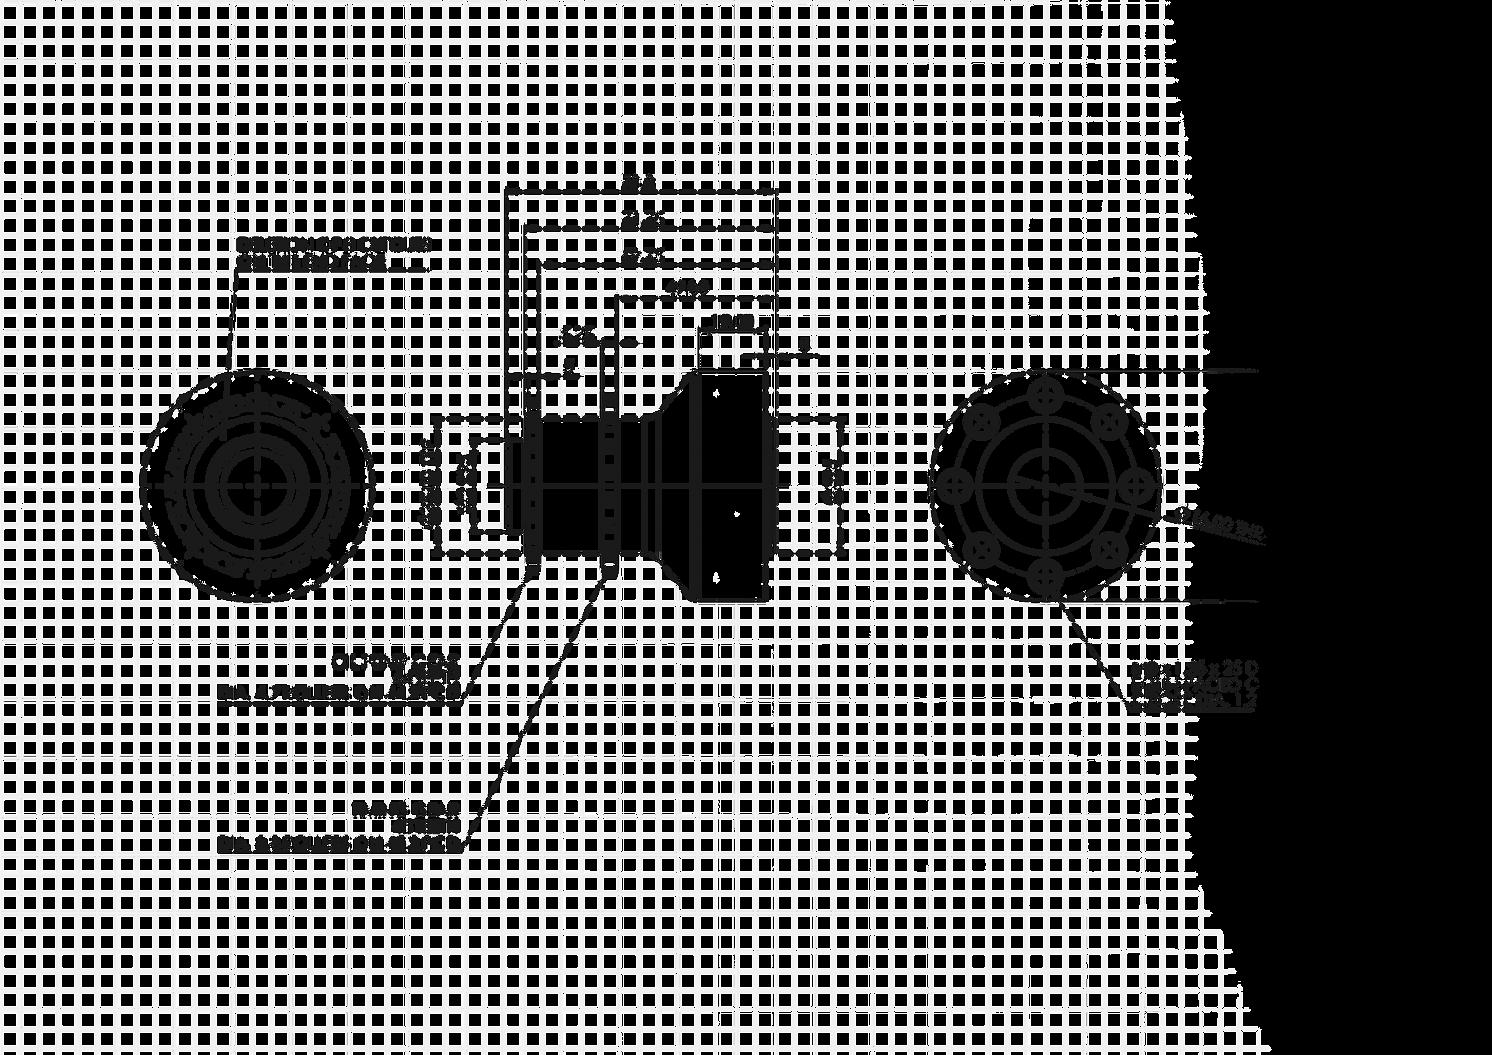 MMRCTP01 Dark drawing.png